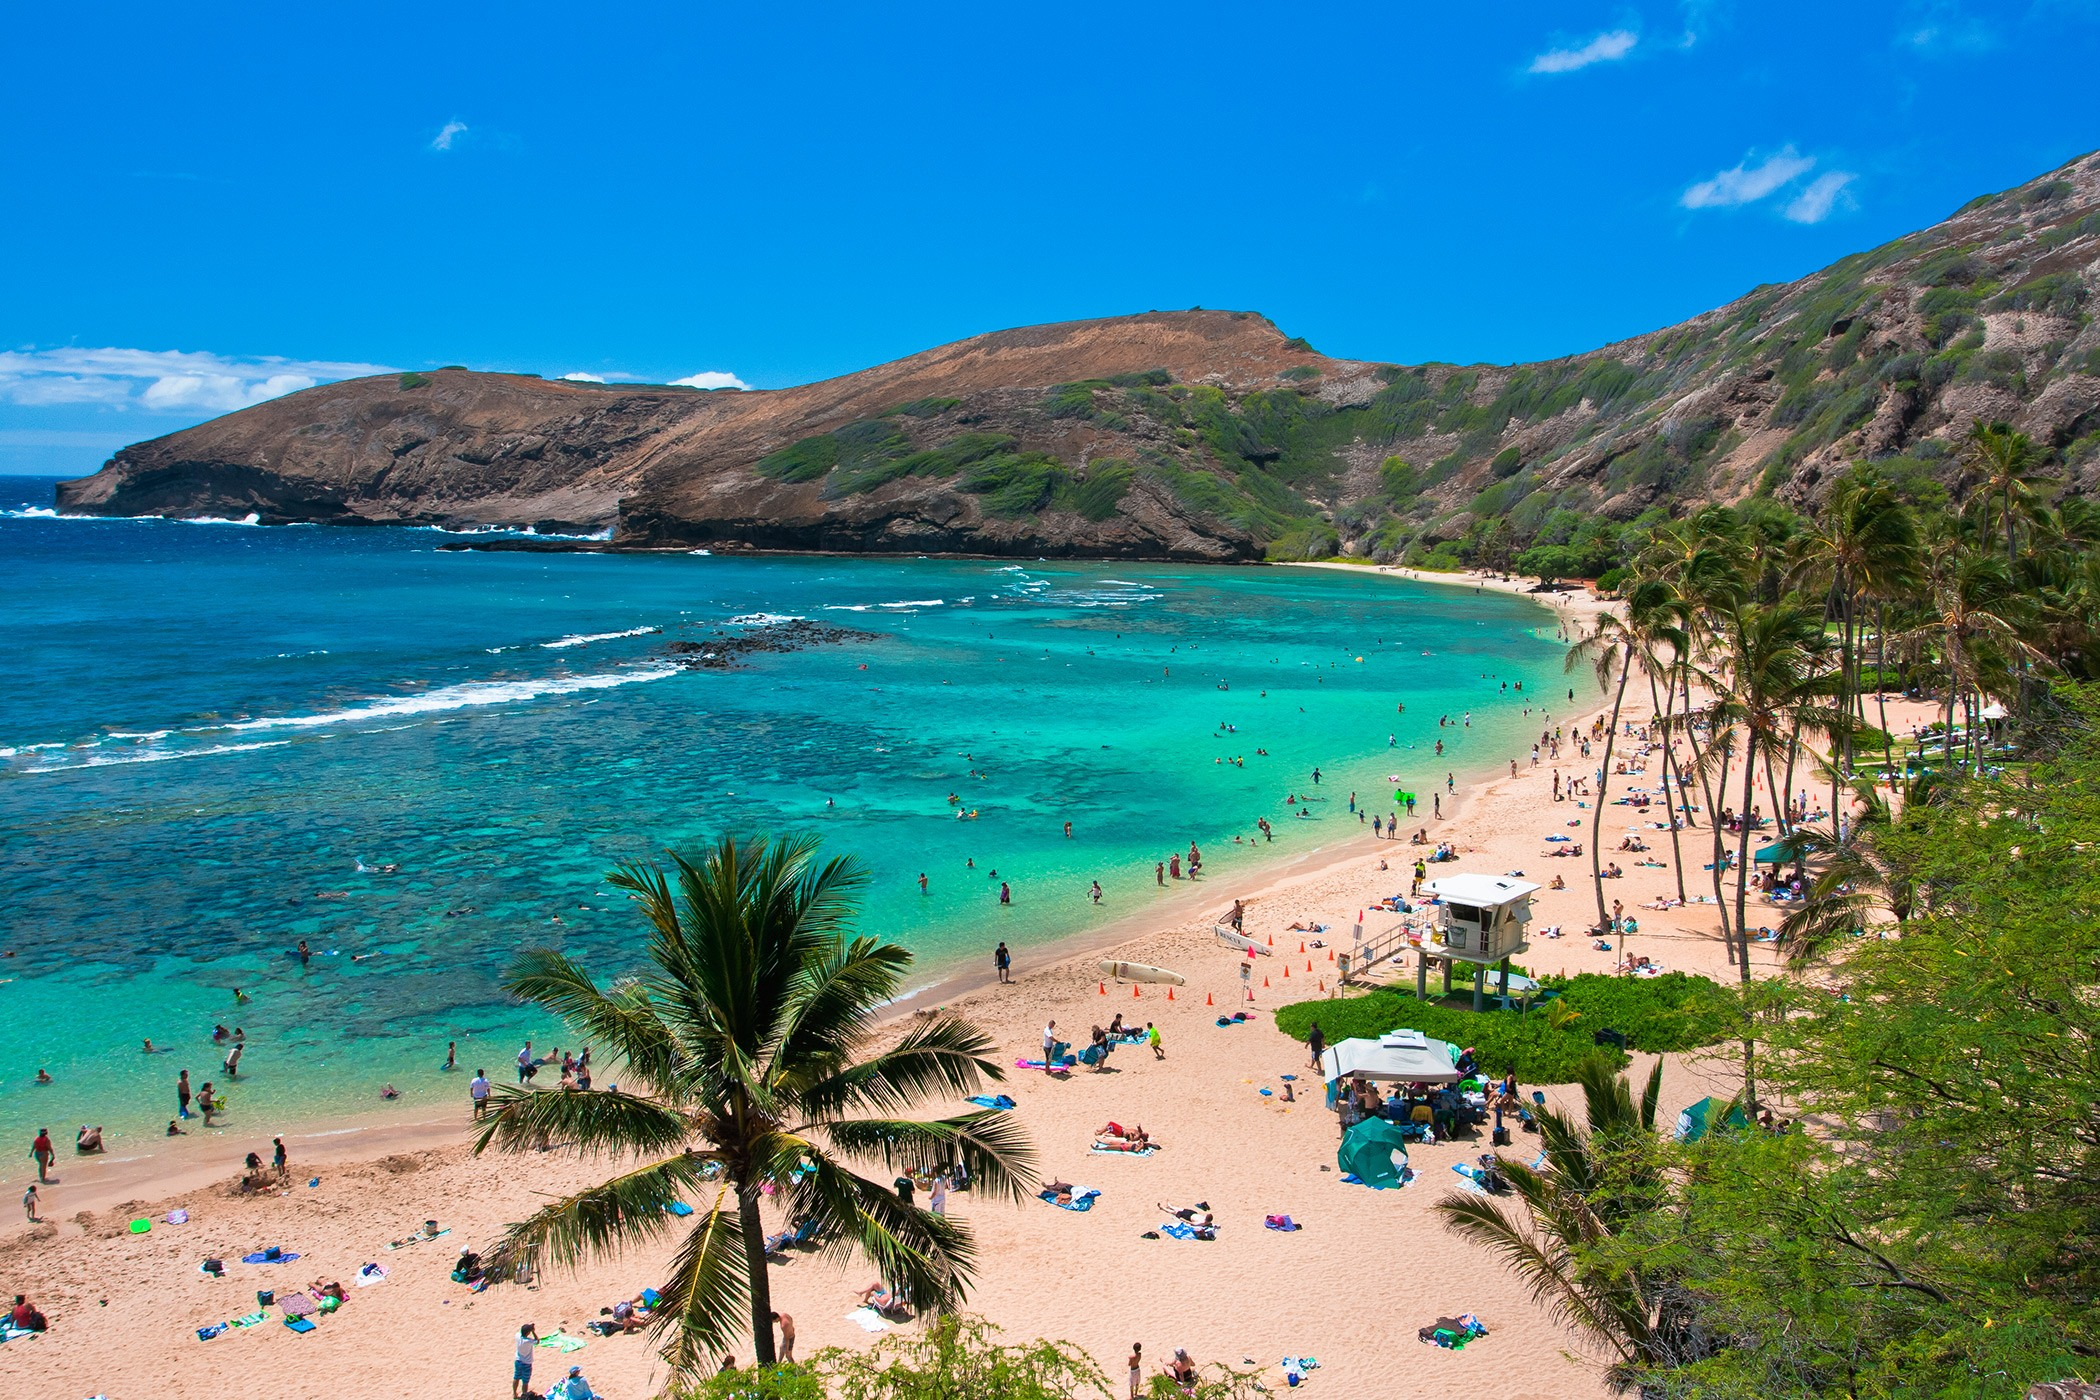 The-Royal-Hawaiian-Resort-Local-Attraction-Hanauma-Bay-Nature-Preserve